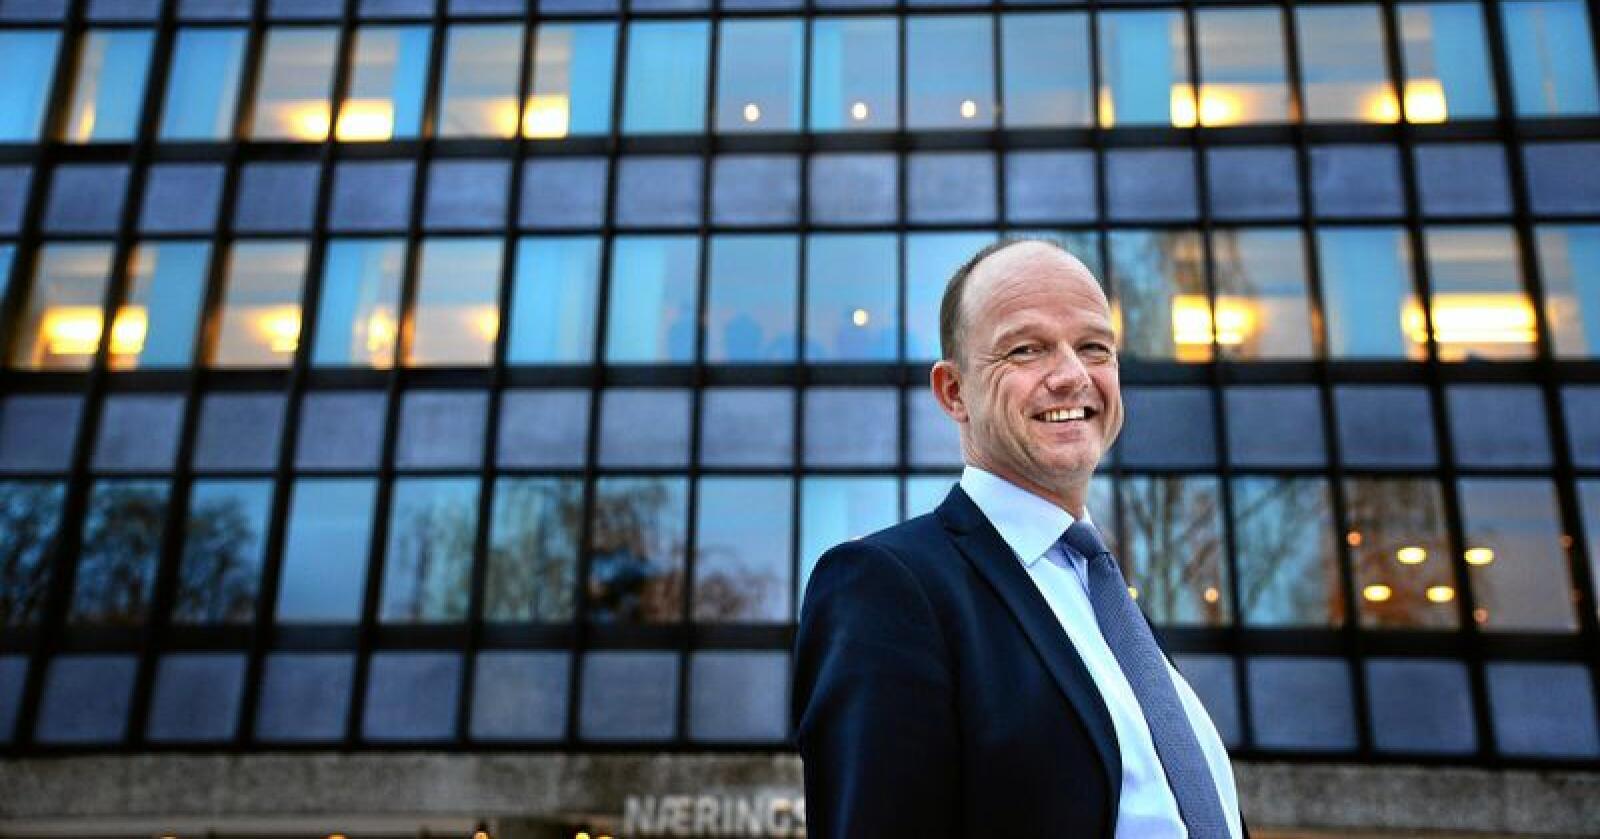 NHO-direktør Ole Erik Almlid. Foto: Siri Juell Rasmussen